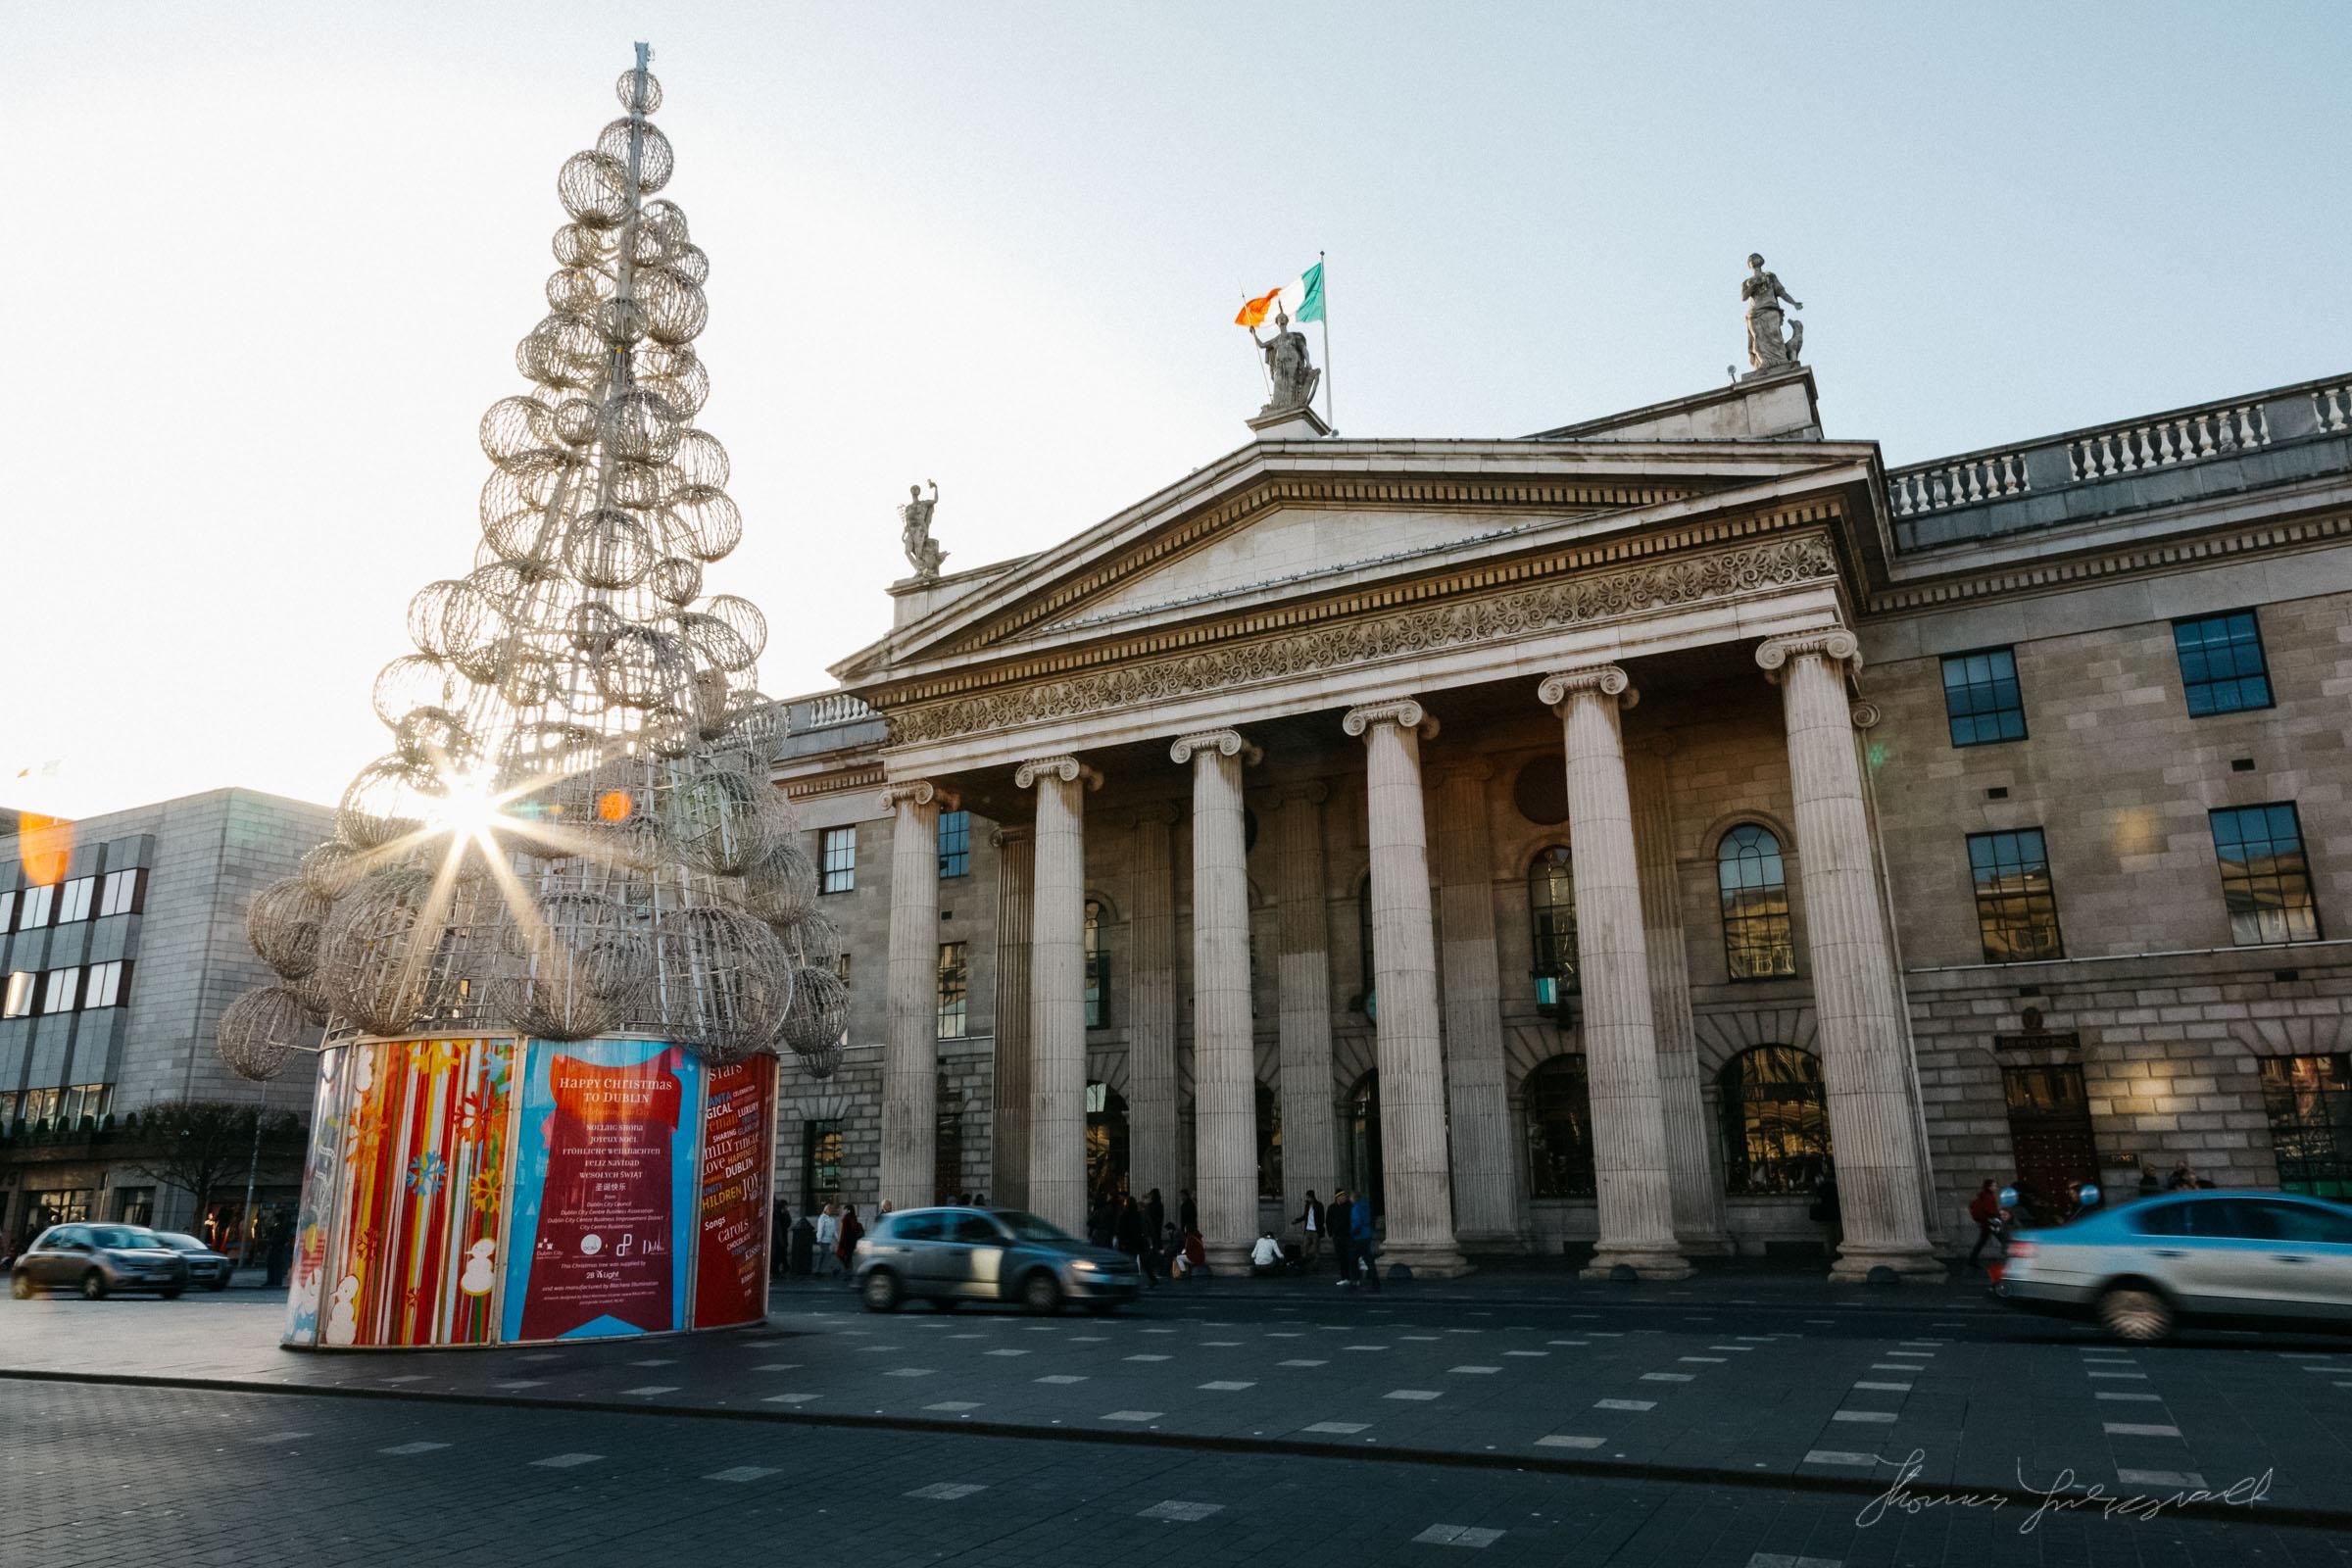 Streets-of-Dublin-Photo-2-32.jpg